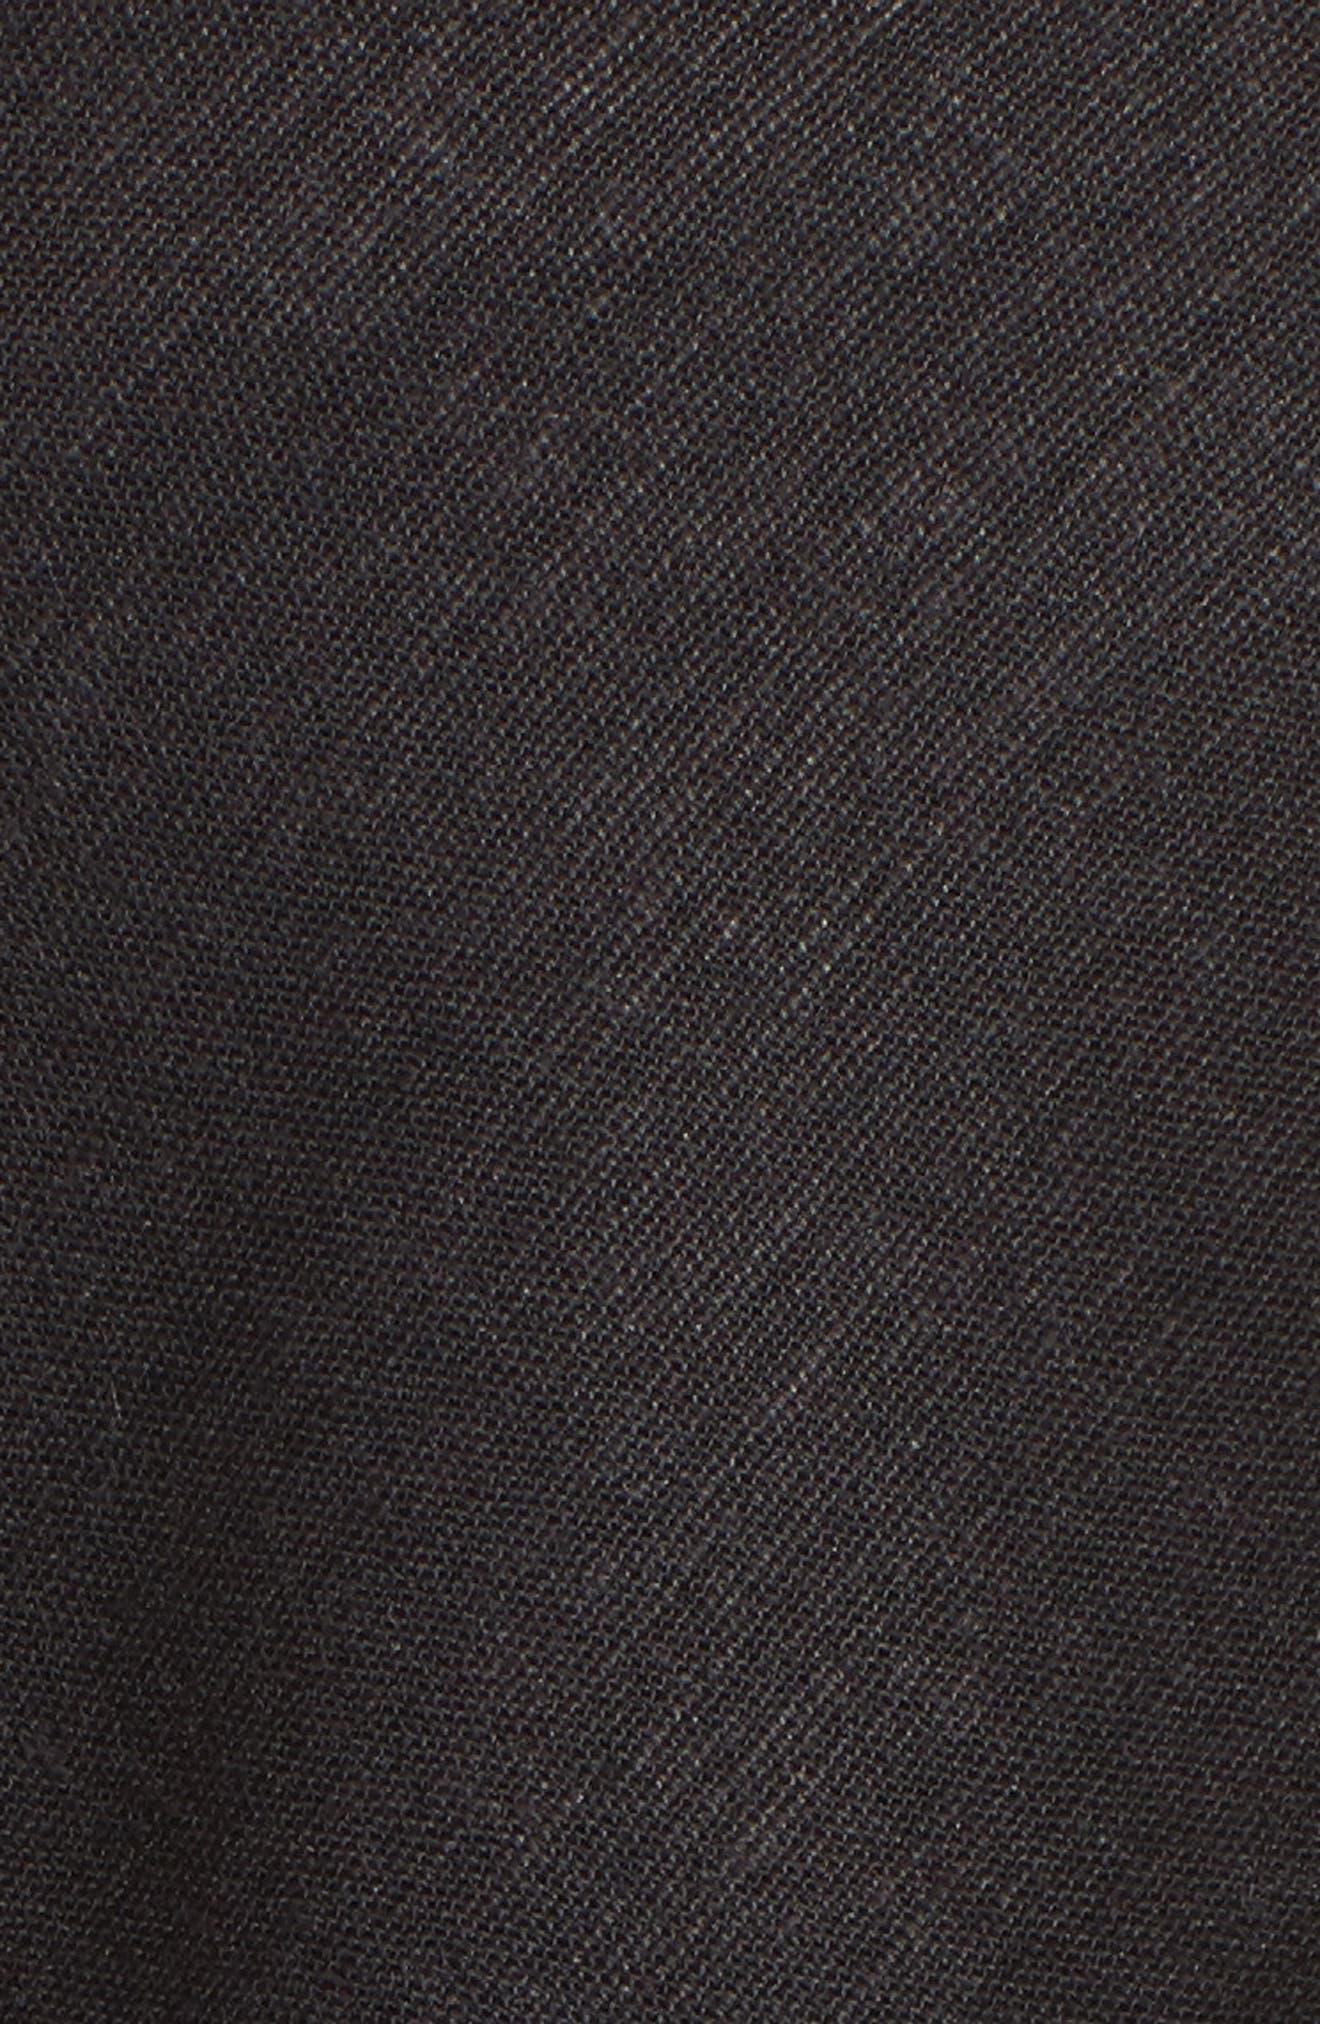 Sinatra Off the Shoulder Jumpsuit,                             Alternate thumbnail 5, color,                             Black